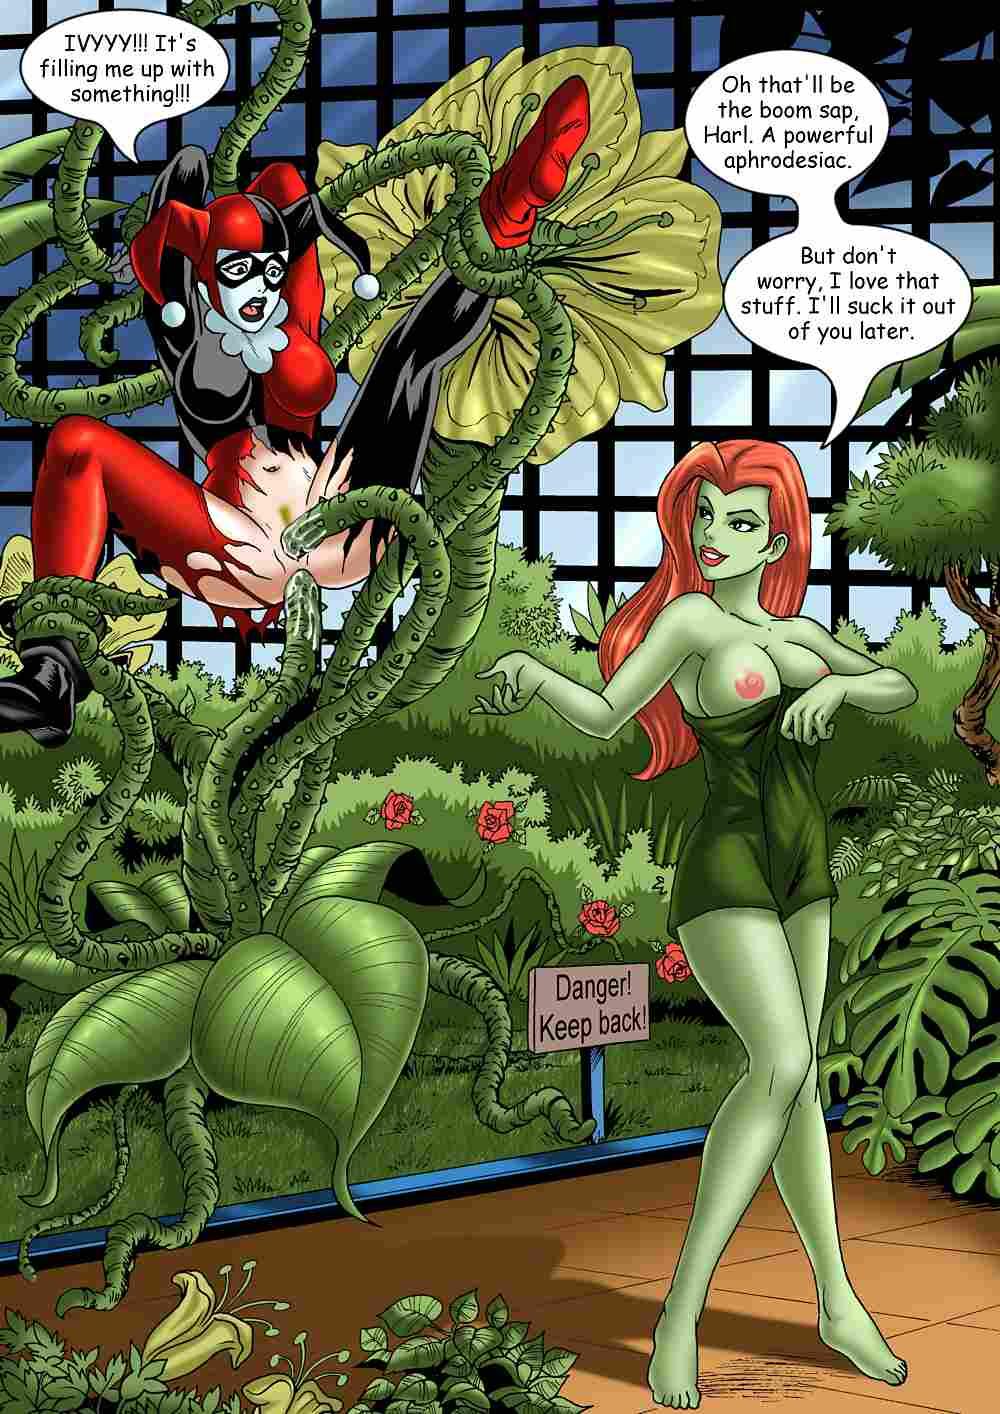 quinn poison harley lesbian ivy Zero darling in the franxx